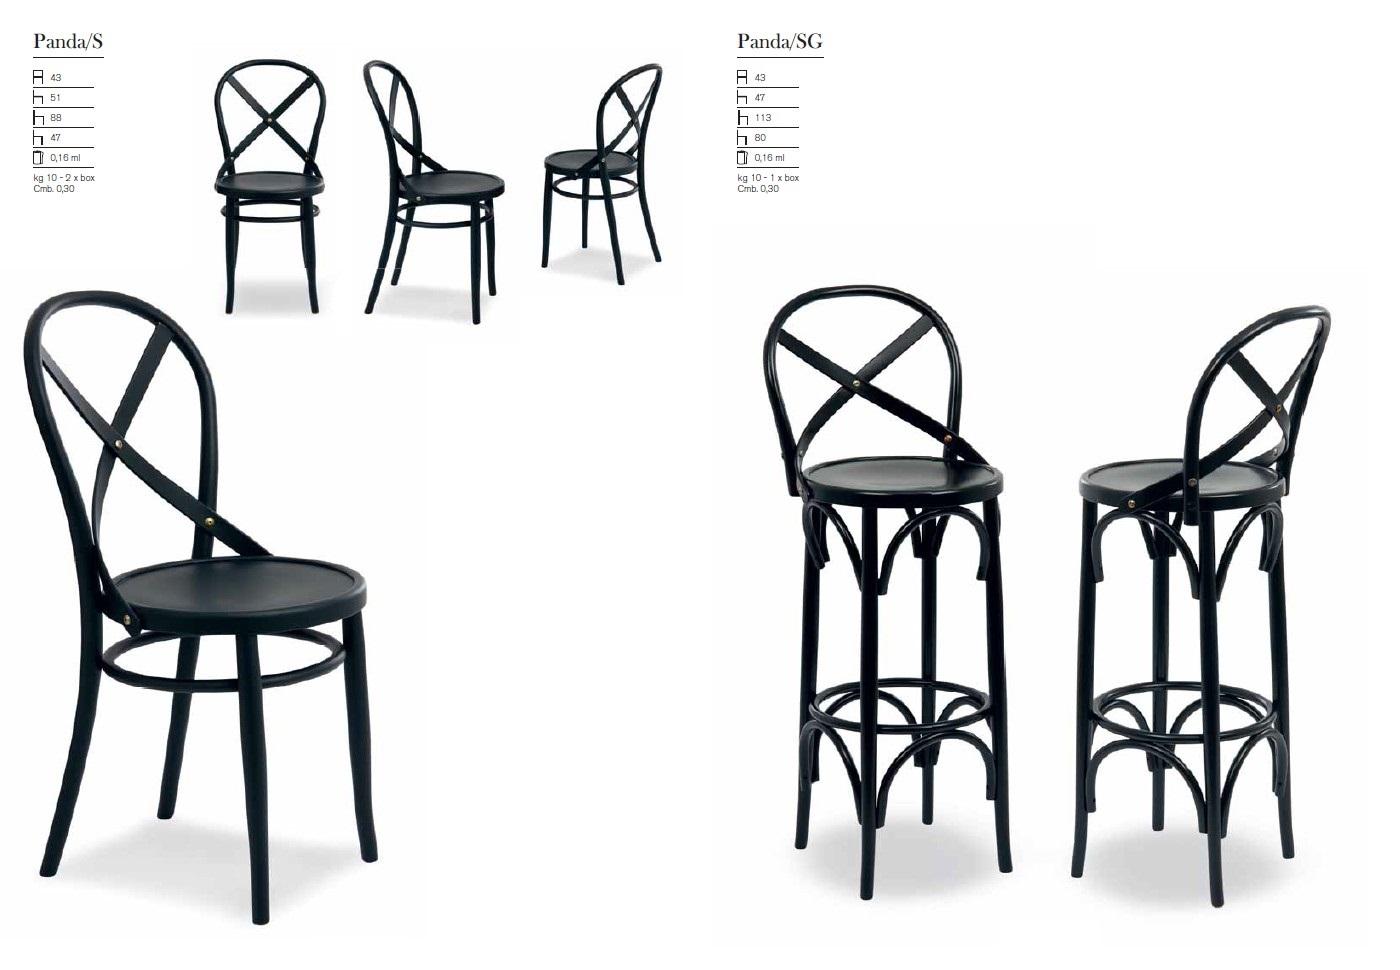 PANDA - Hocker und Stühle aus Holz | madeinitaly.de